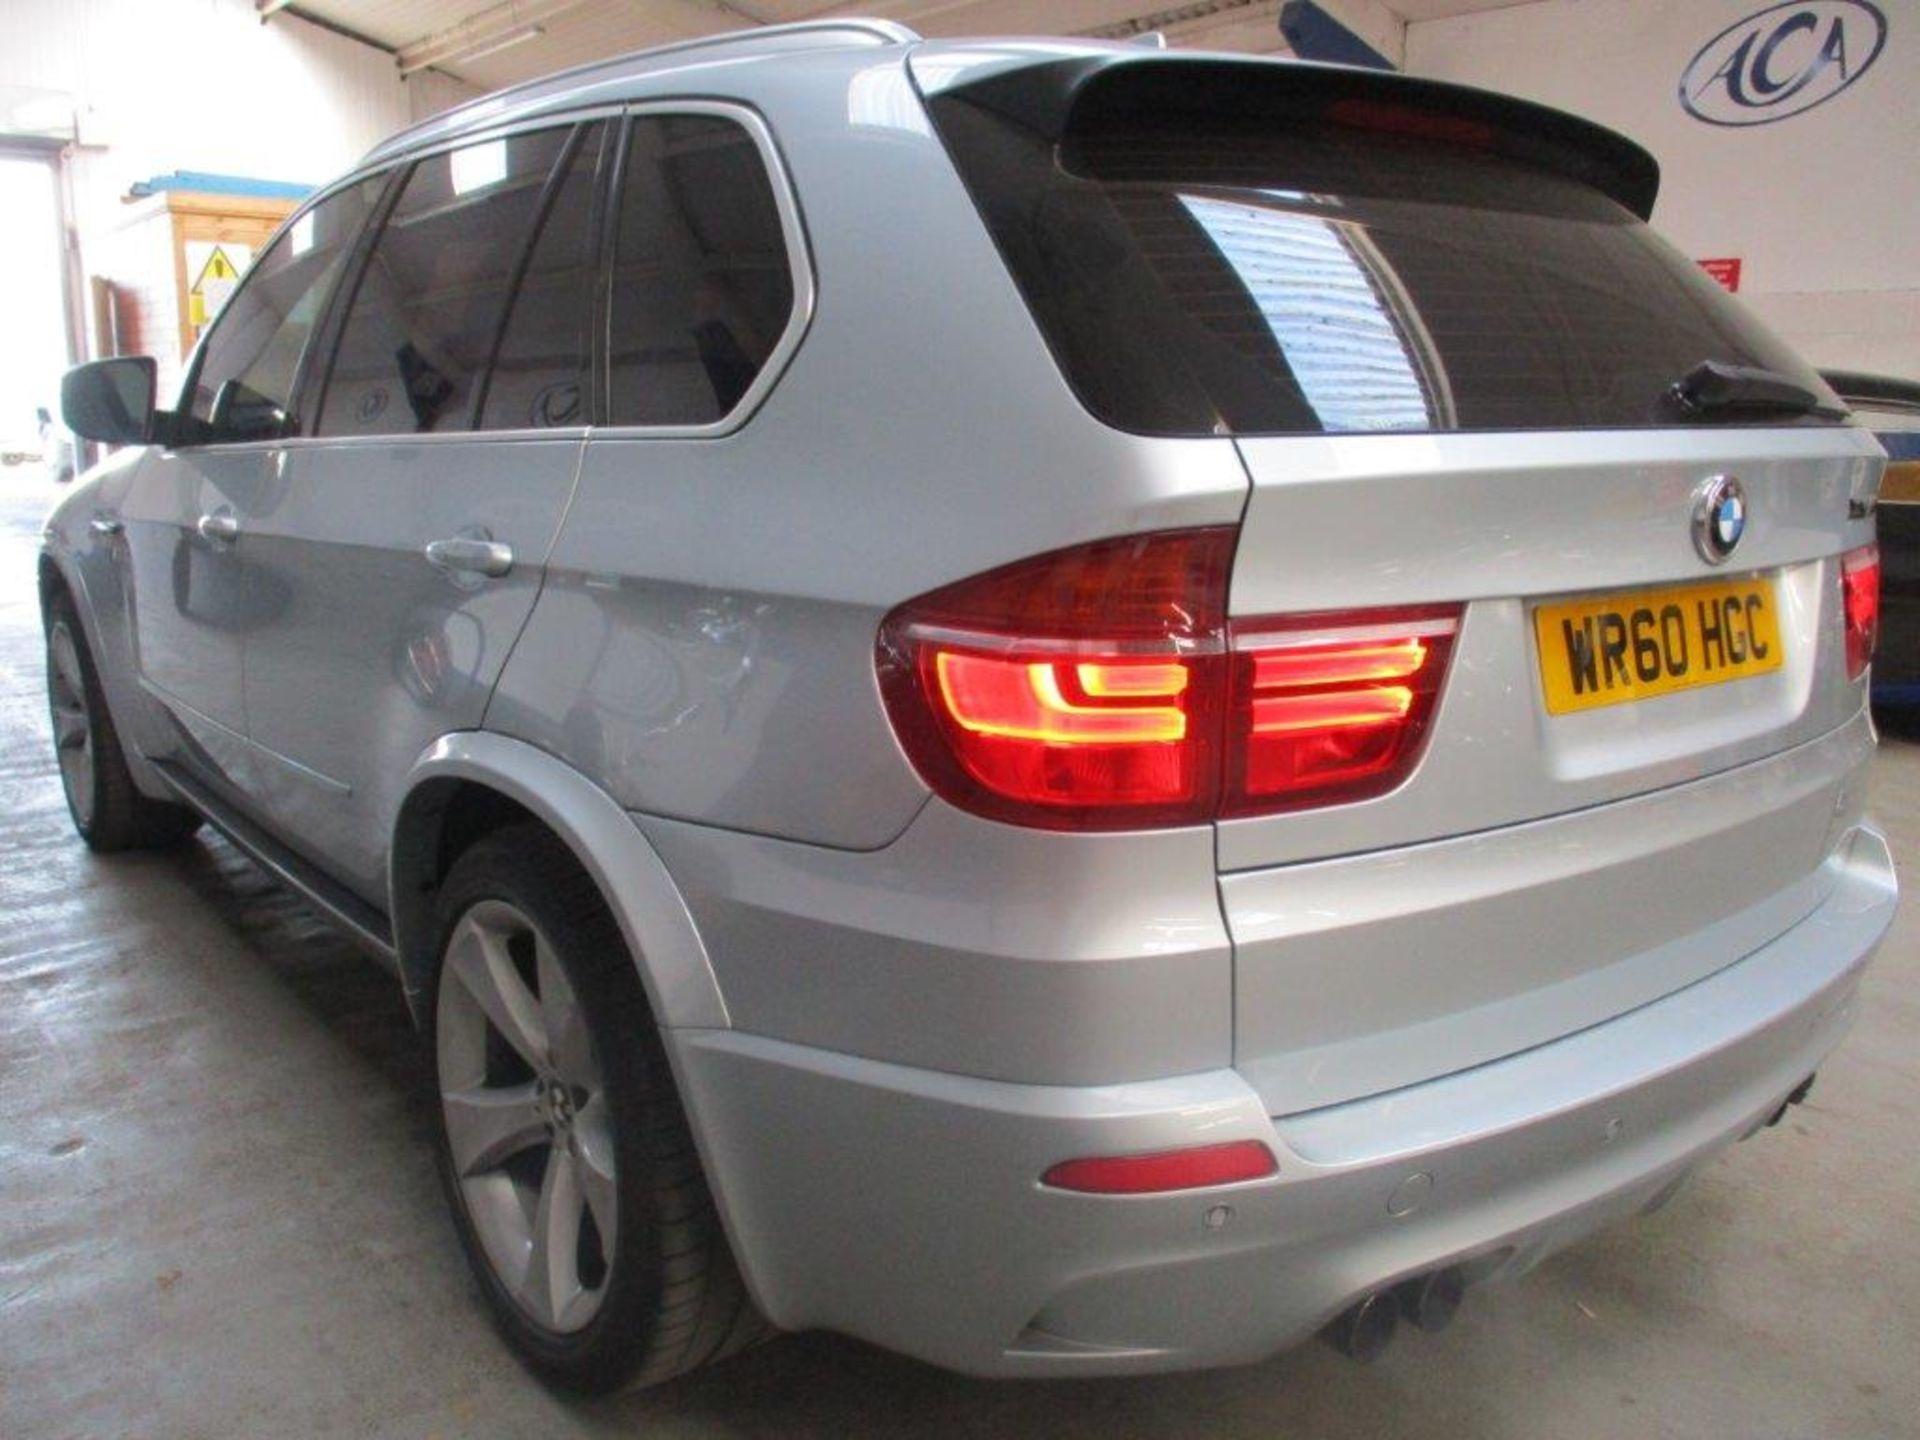 60 10 BMW X5 M Turbo Auto - Image 4 of 35